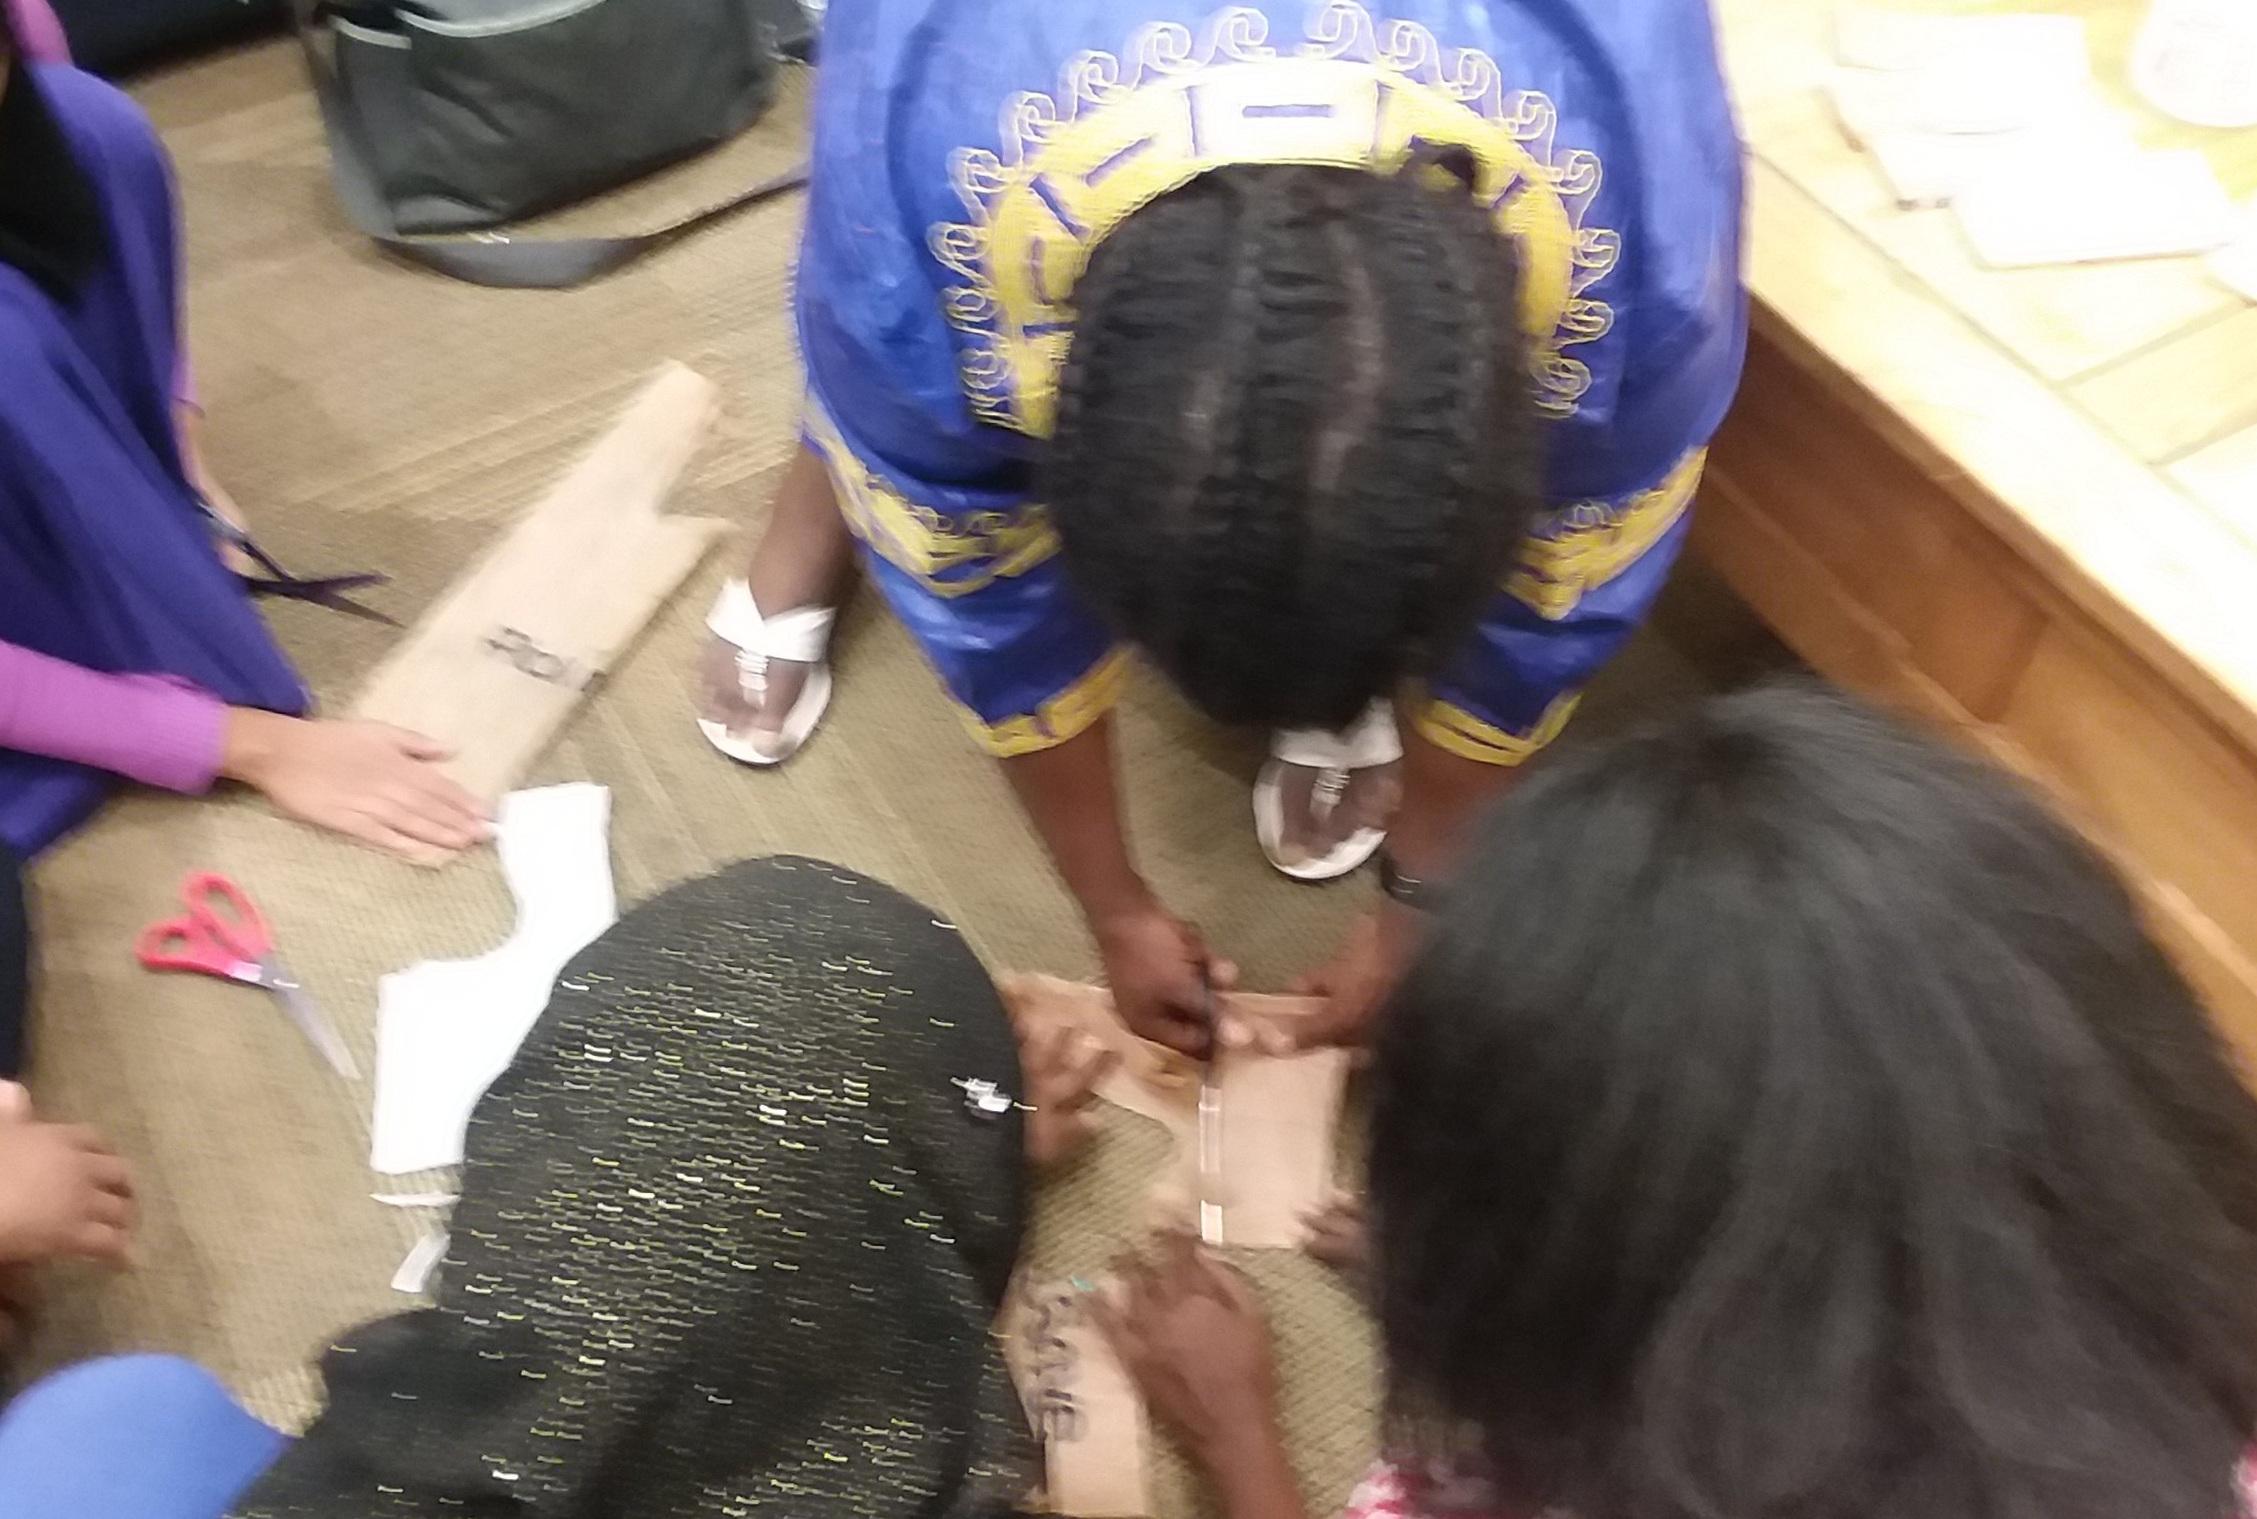 Demonstrating how to crochet using plastic bags